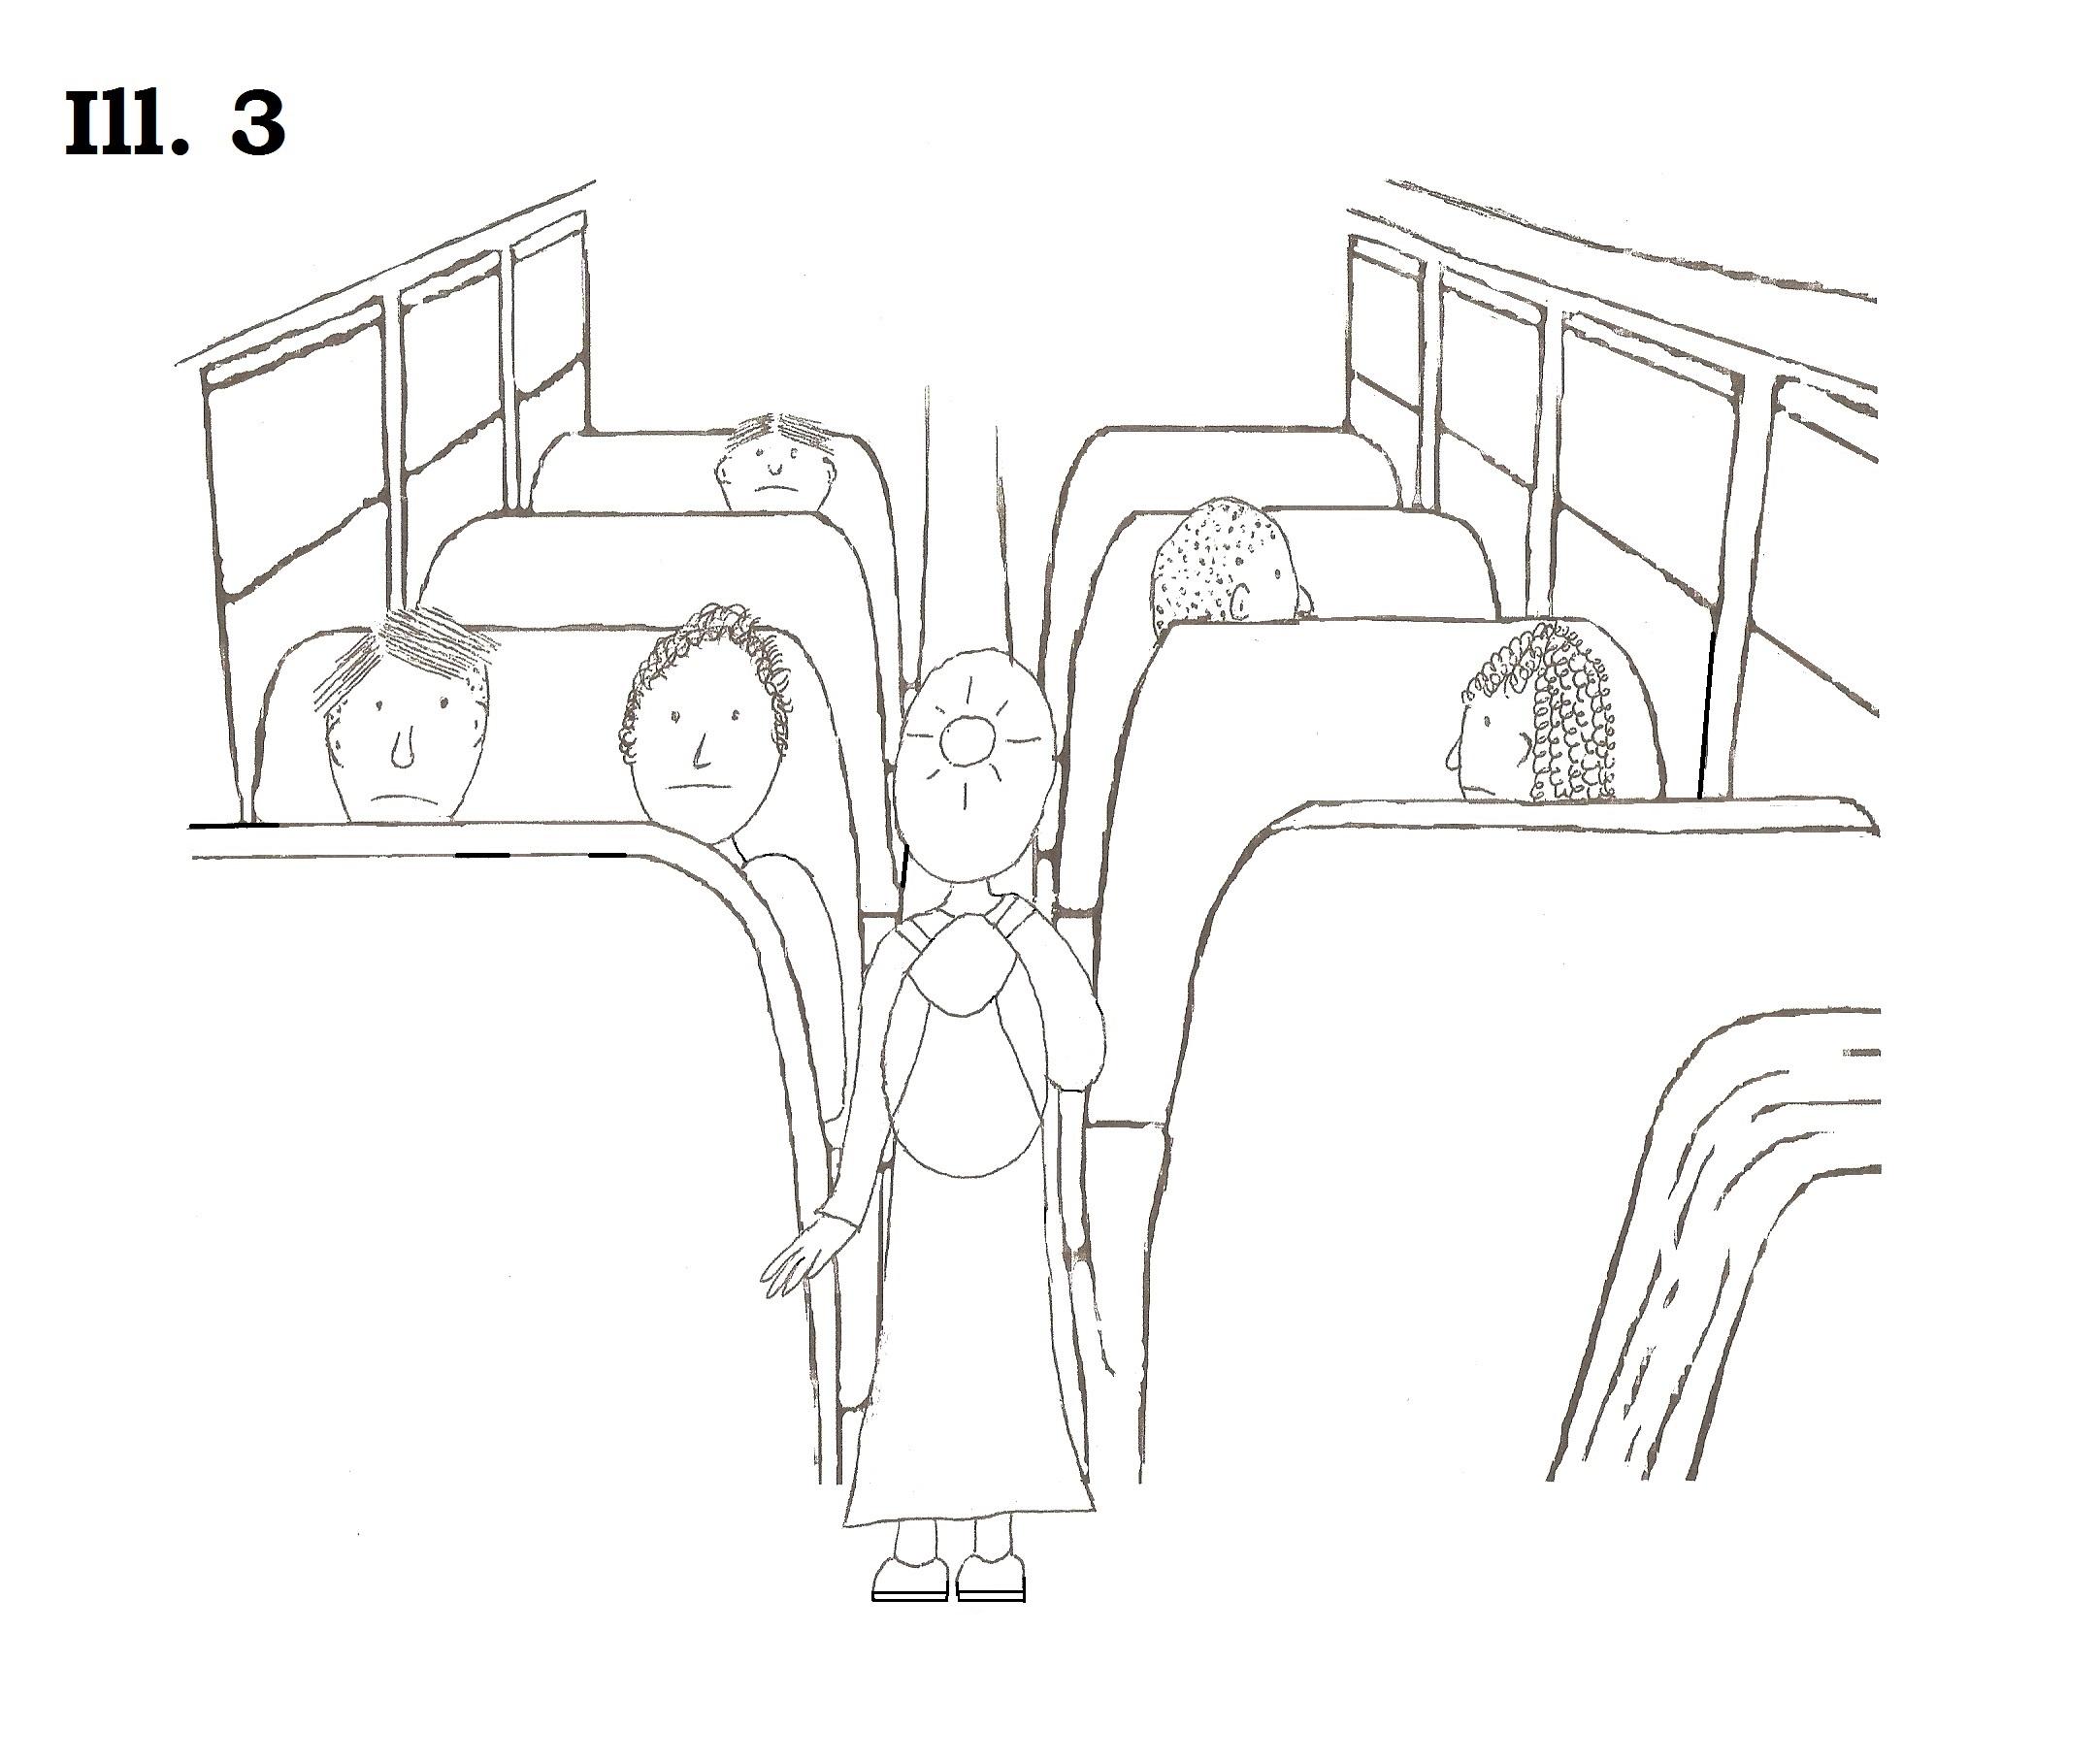 #3 Walking into Bus 2